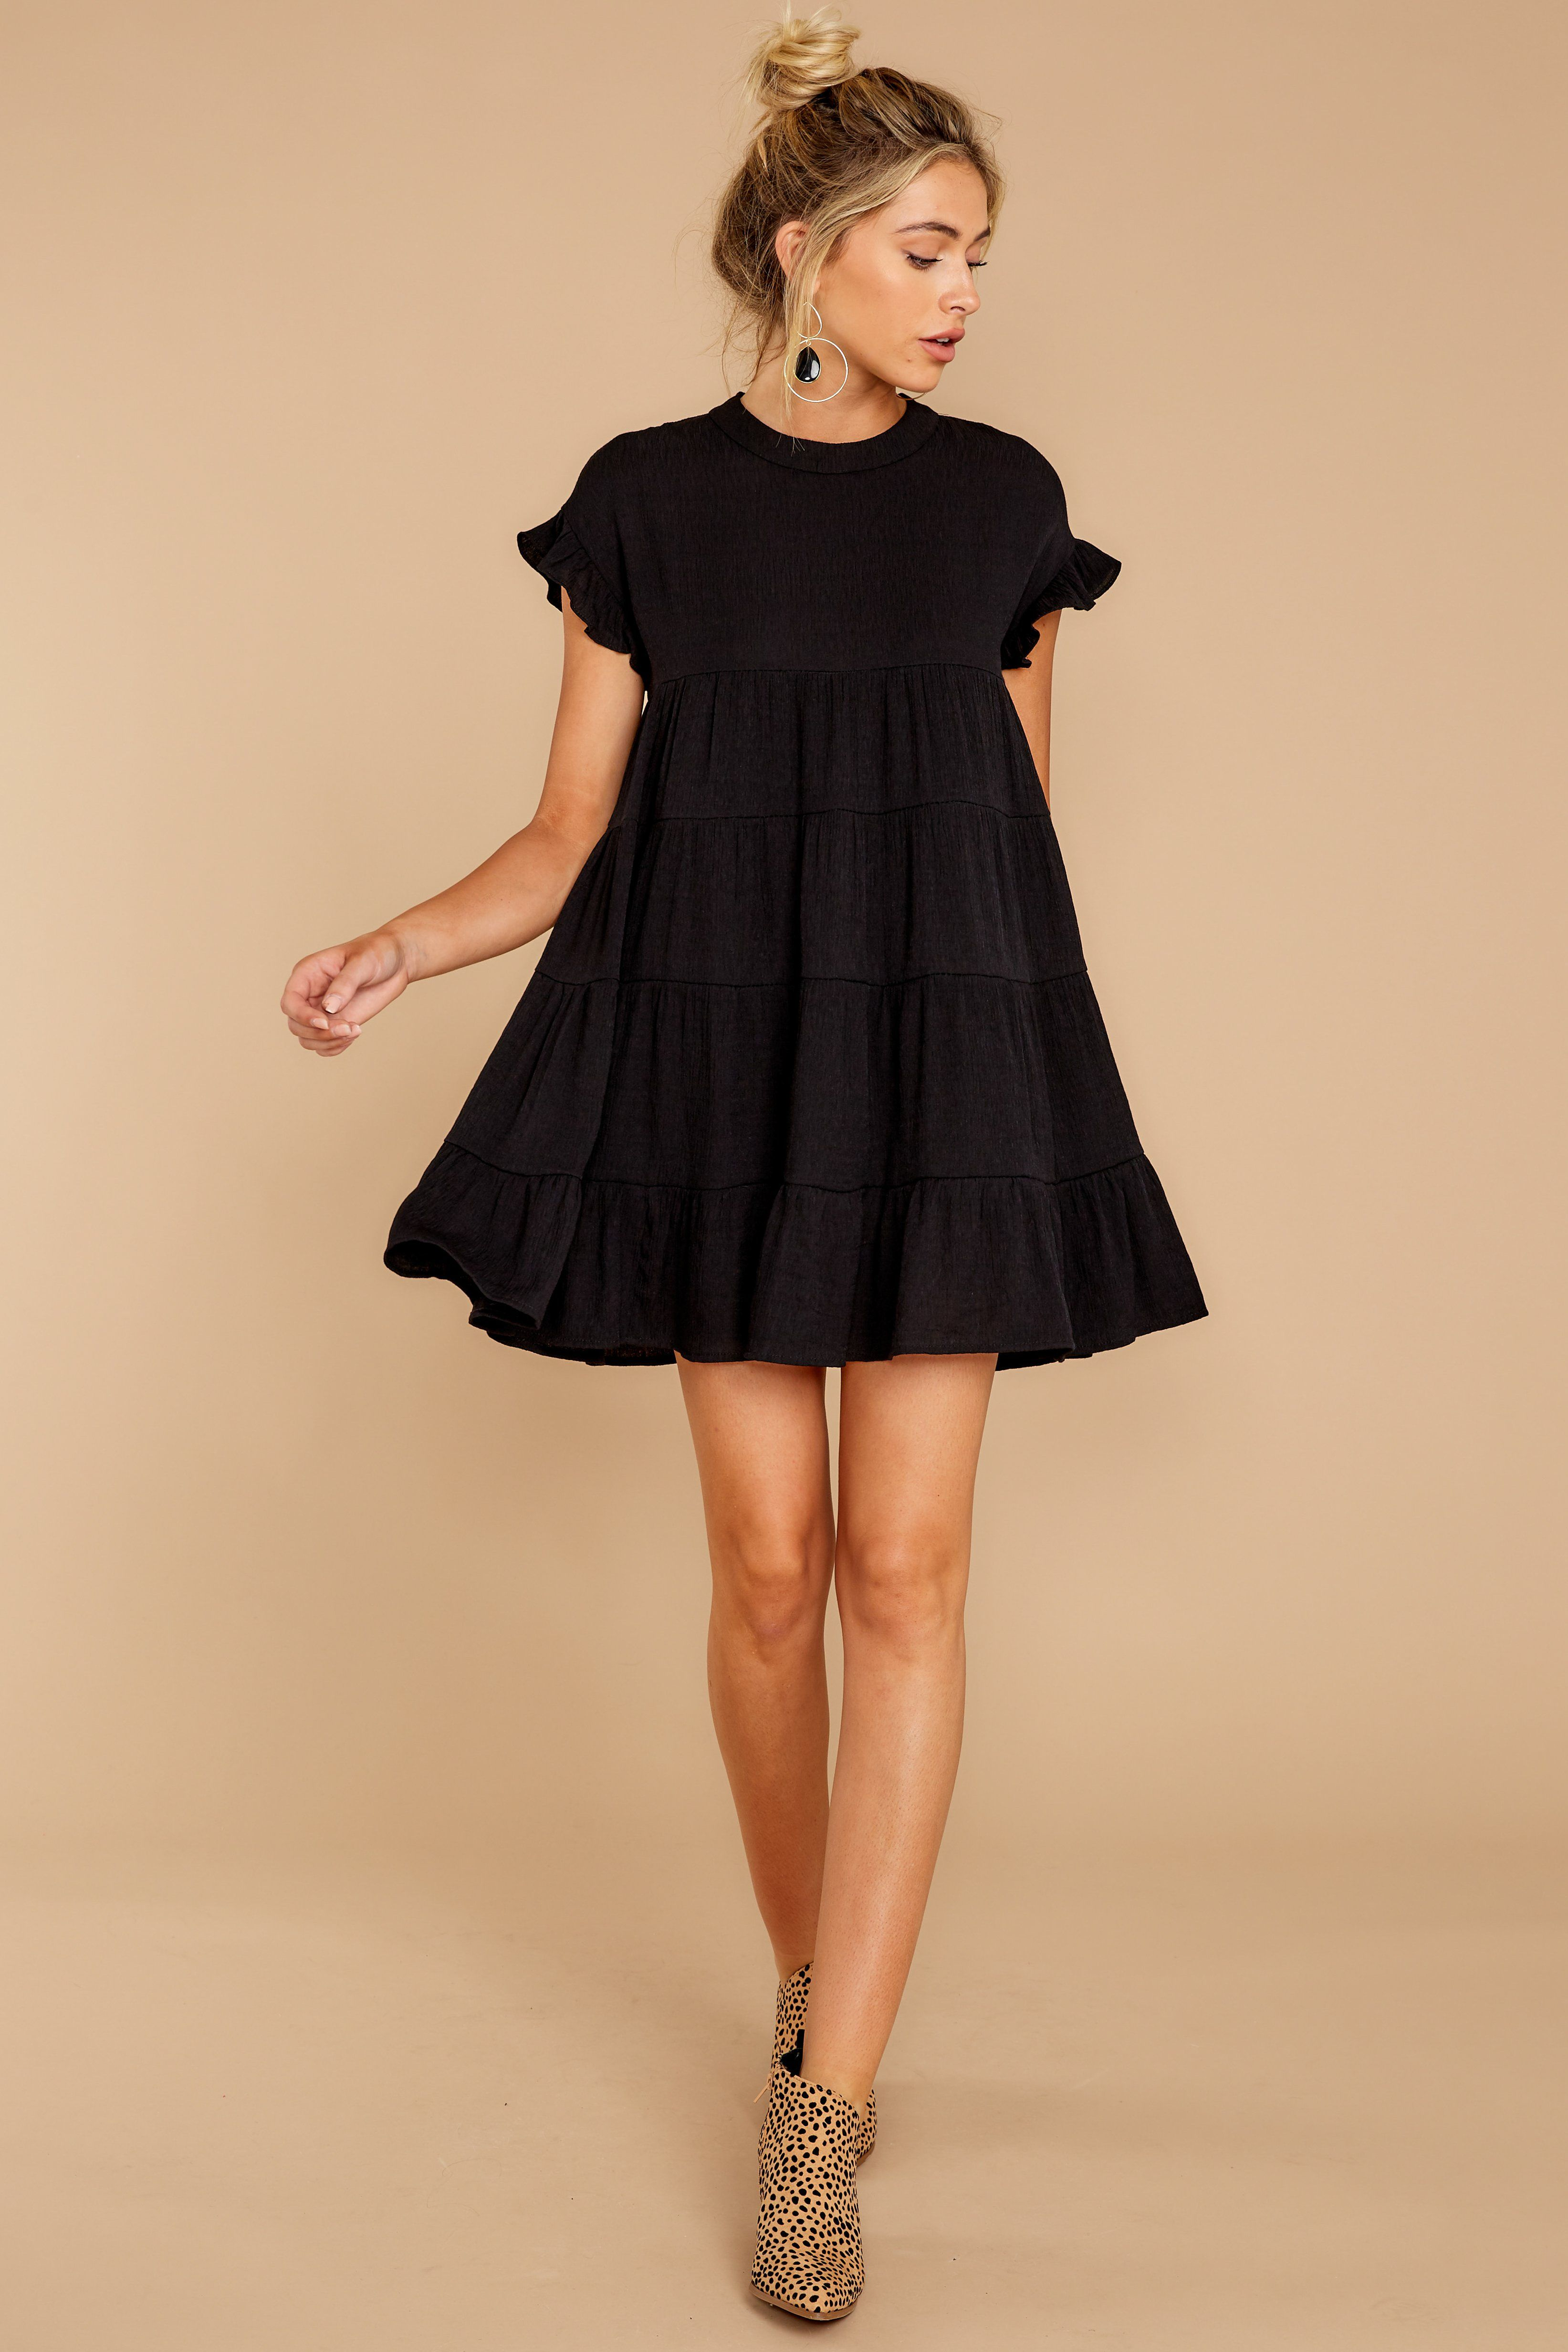 Casual Black Shift Dress Flowy Short Sleeve Dress Dress 44 00 Red Dress Black Dress Accessories Short Dresses Casual Black Dress Outfits [ 4929 x 3286 Pixel ]